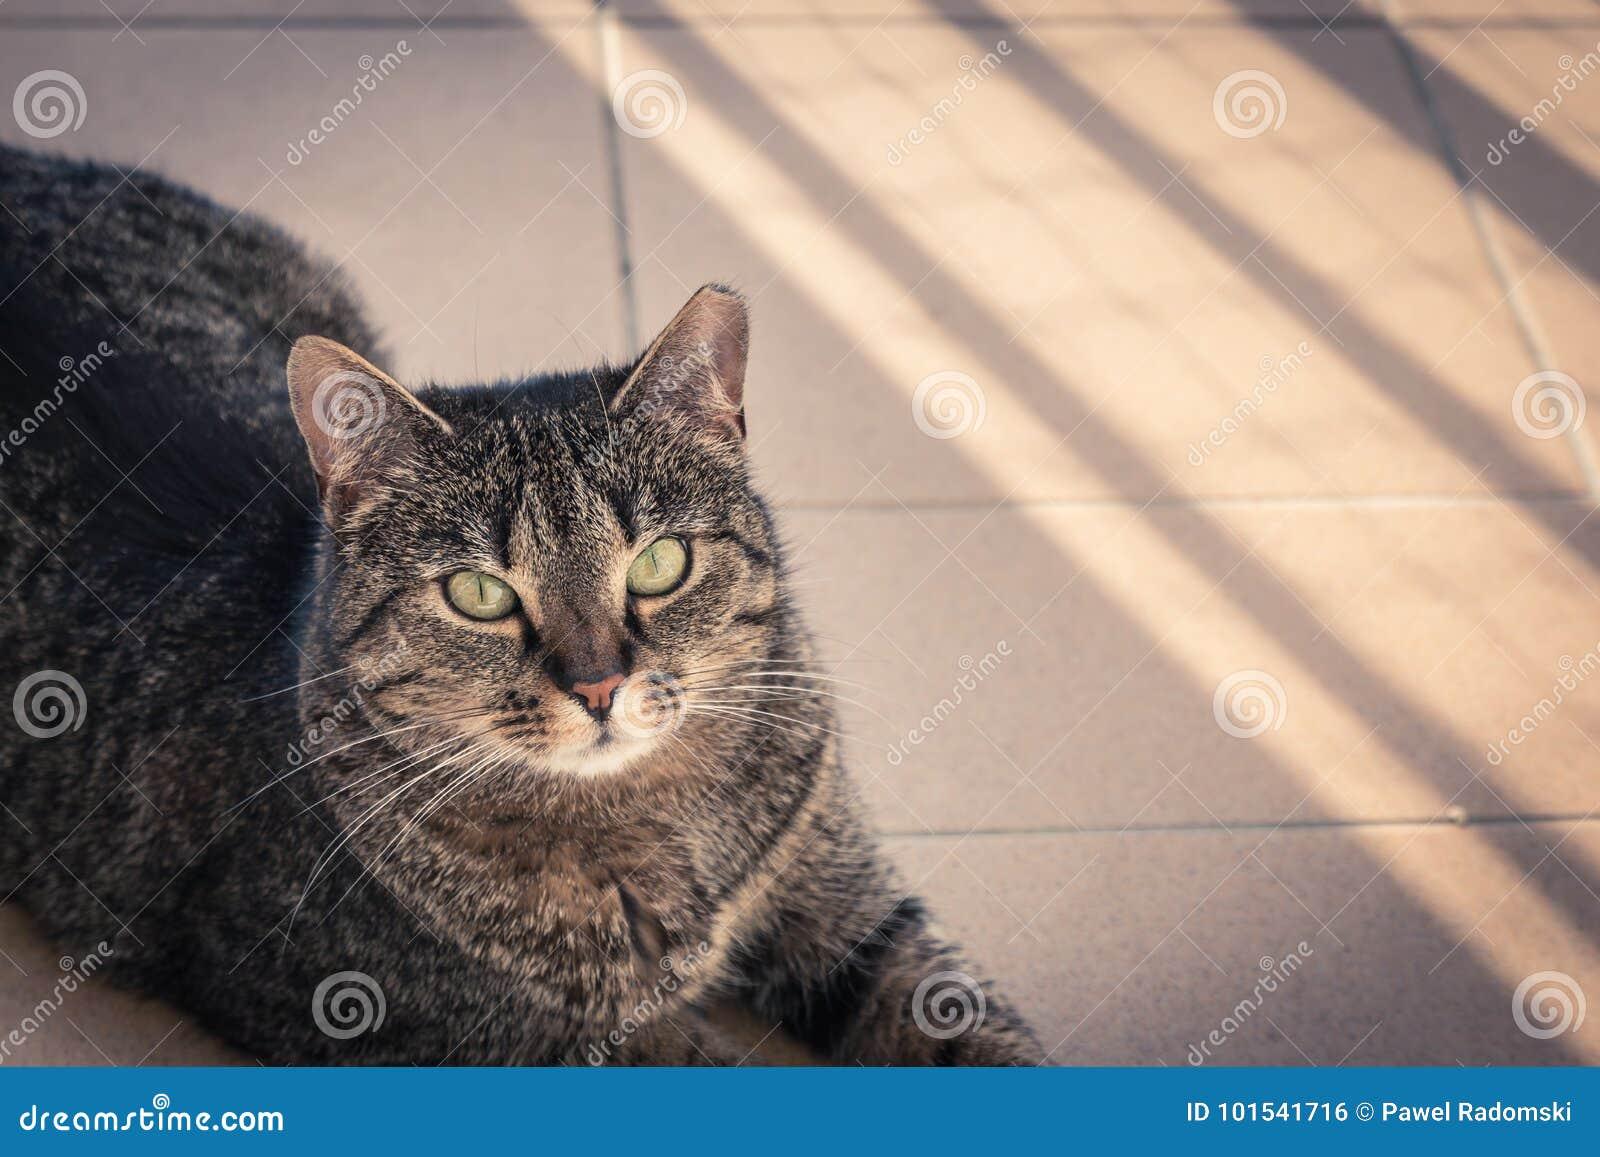 aeafb7fe68c6 Γάτα που βρίσκεται σε ένα μπαλκόνι